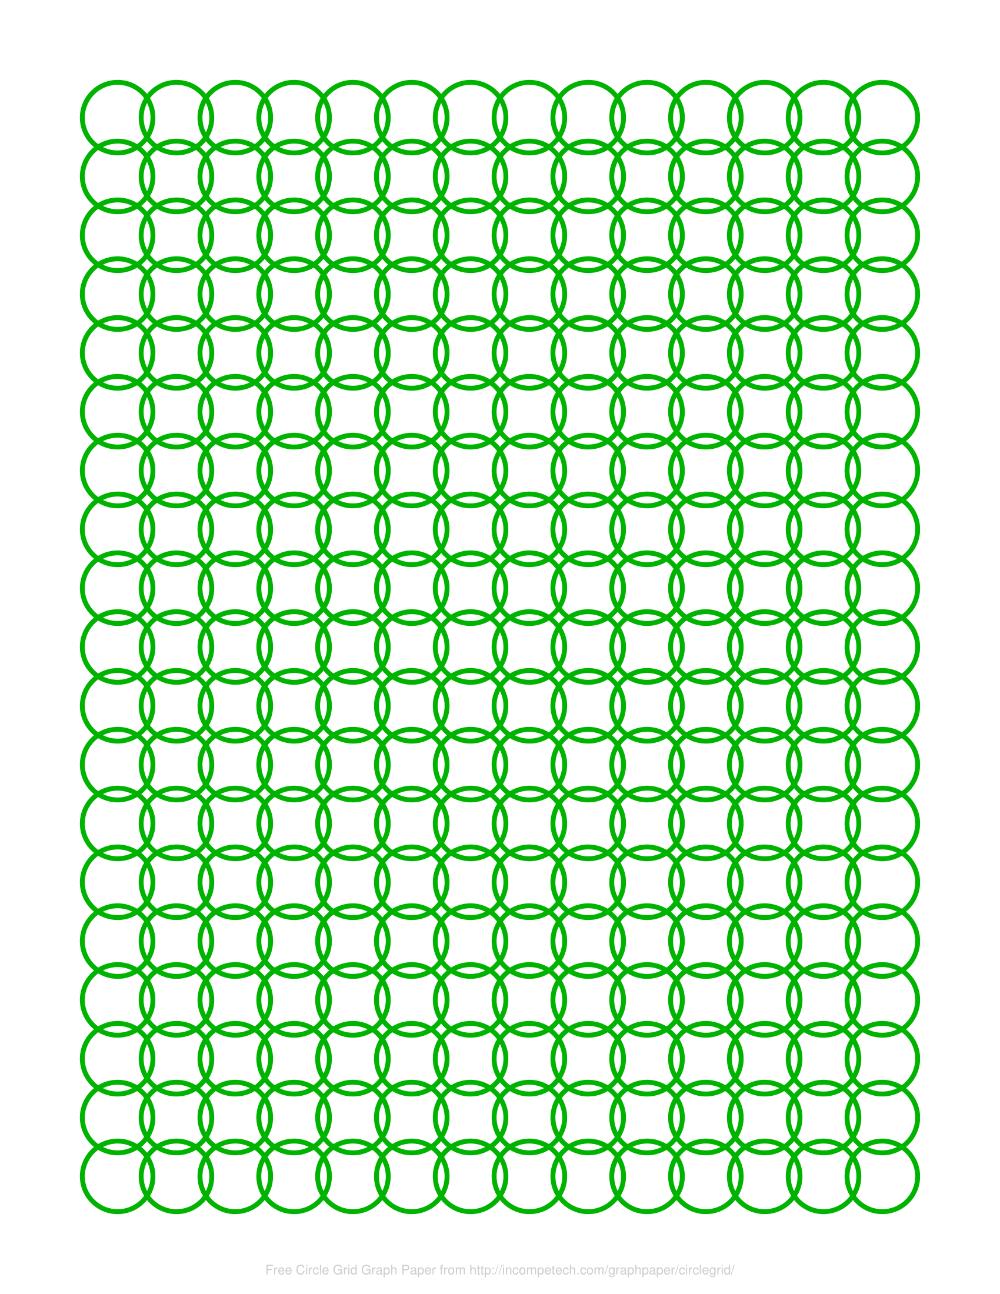 Online grid paper ideas